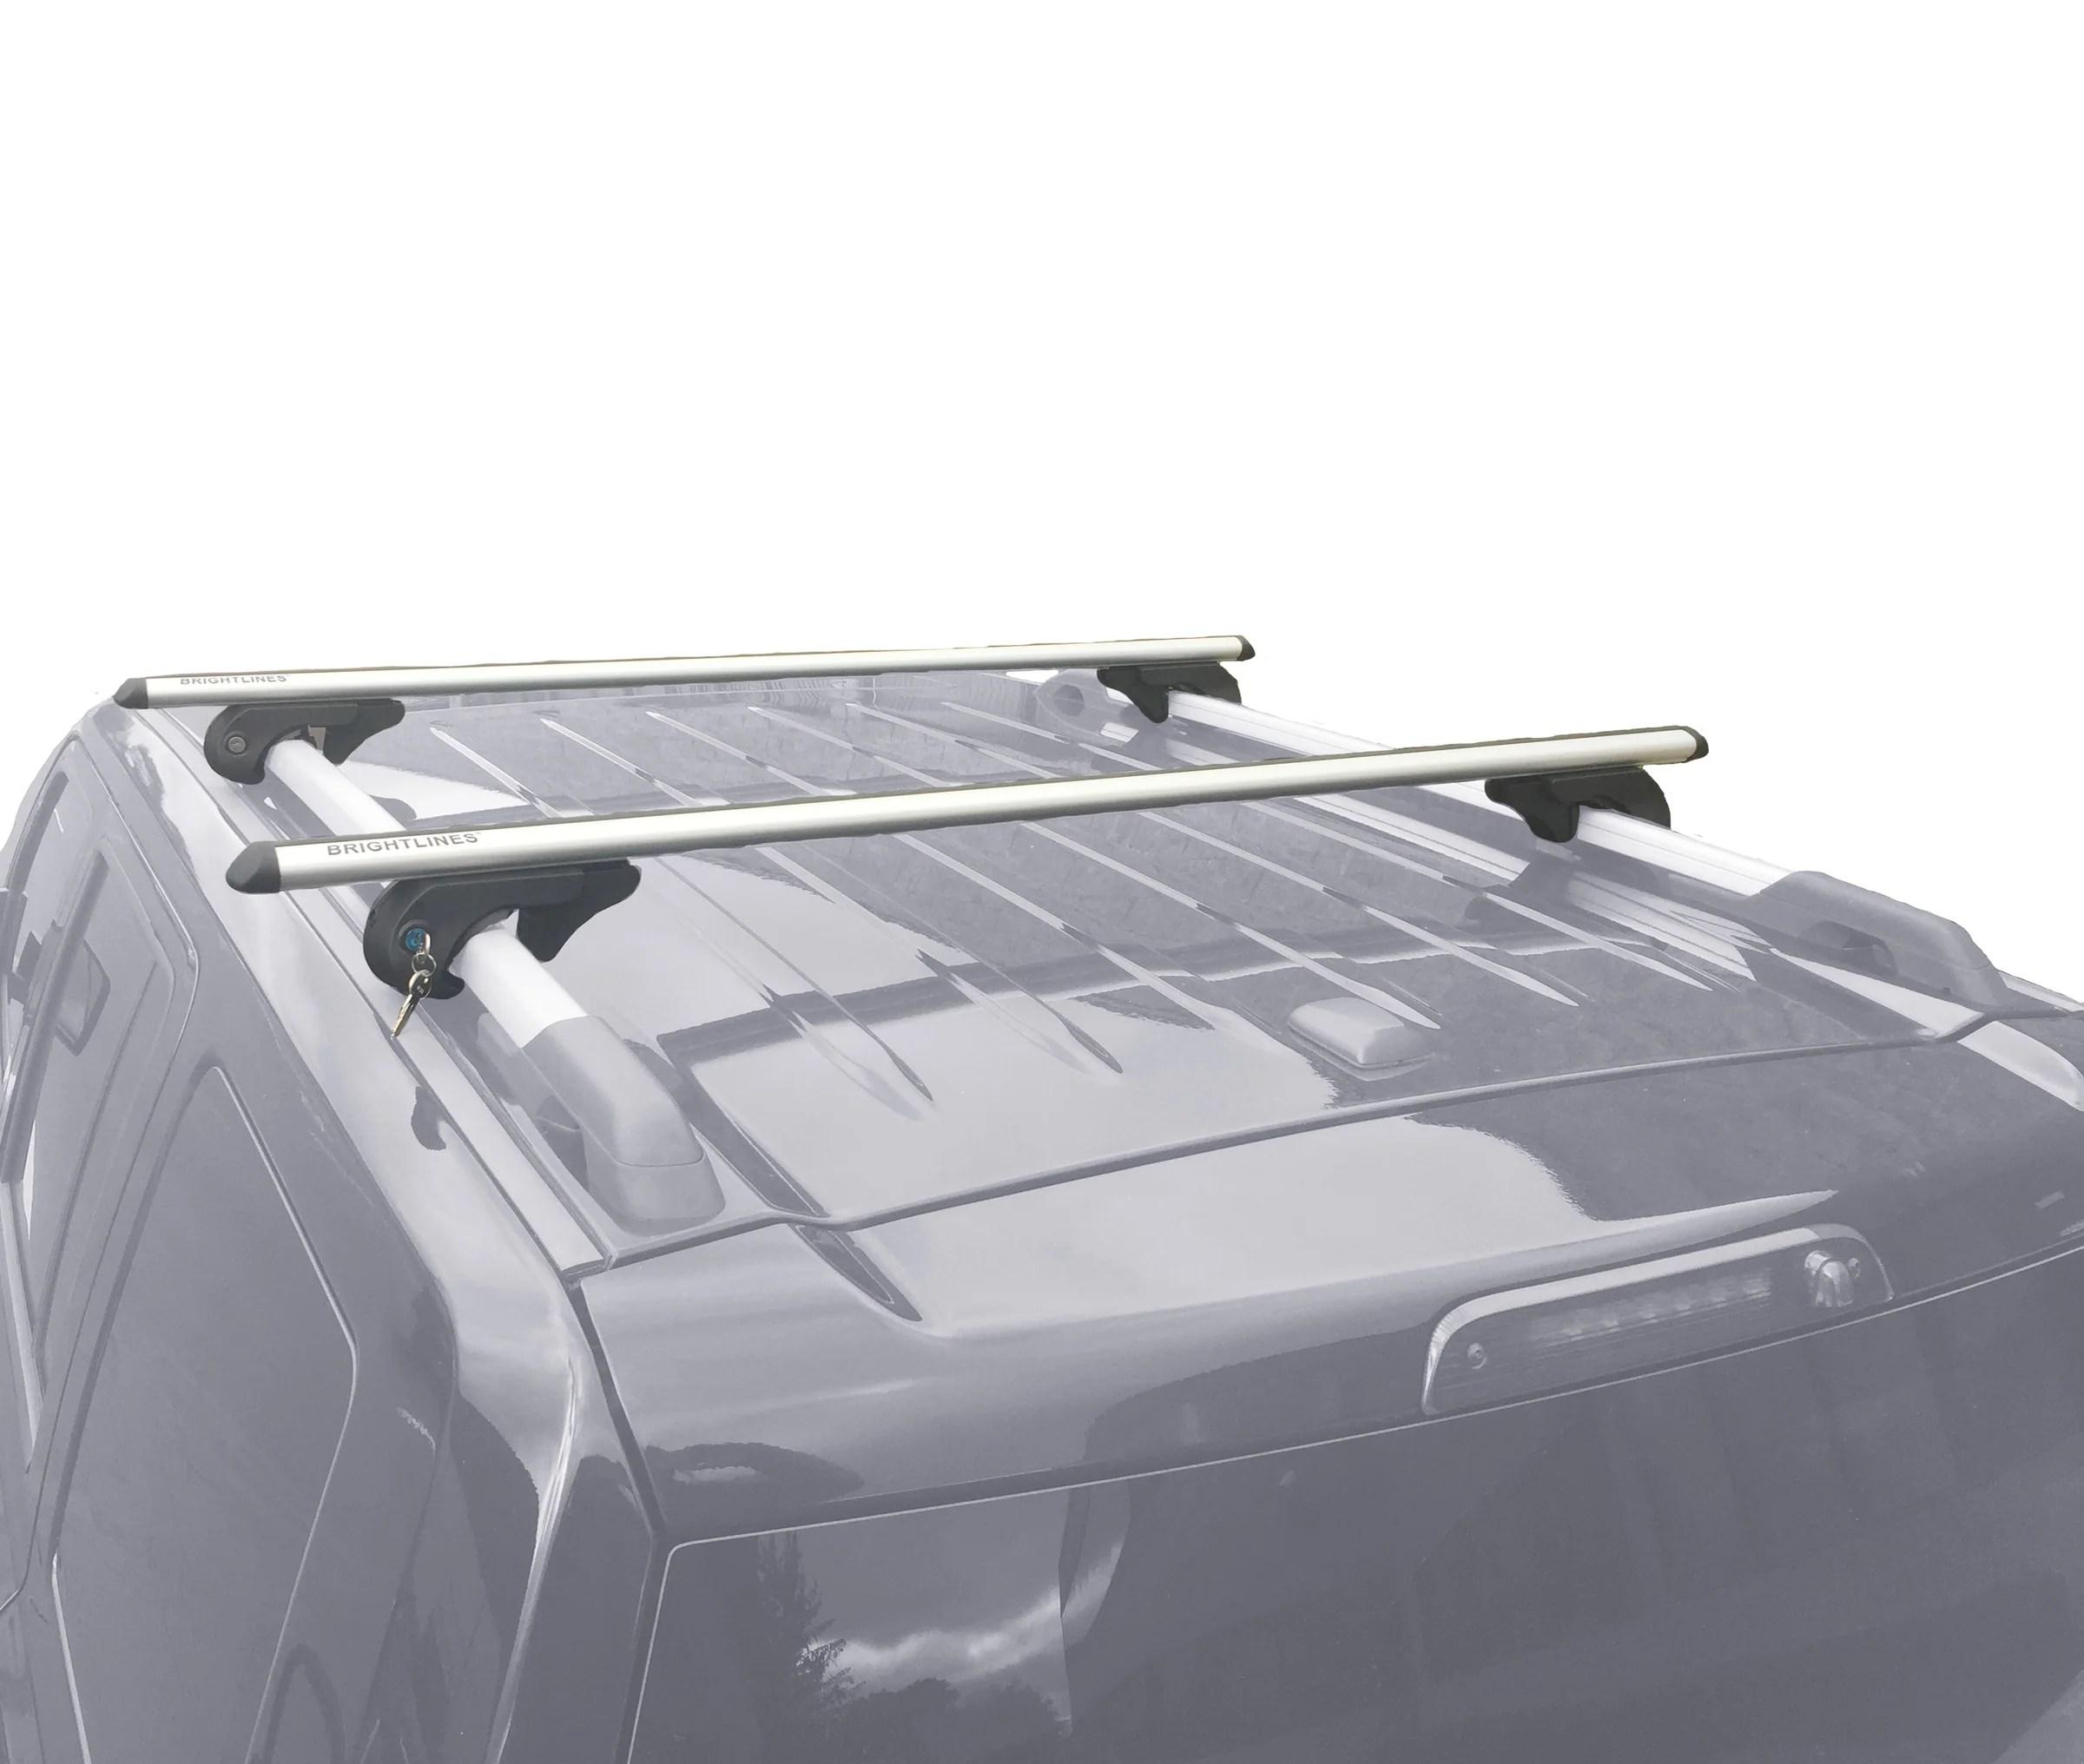 brightlines hyundai tucson roof rack crossbars 2004 2015 asg auto sports [ 2400 x 2032 Pixel ]